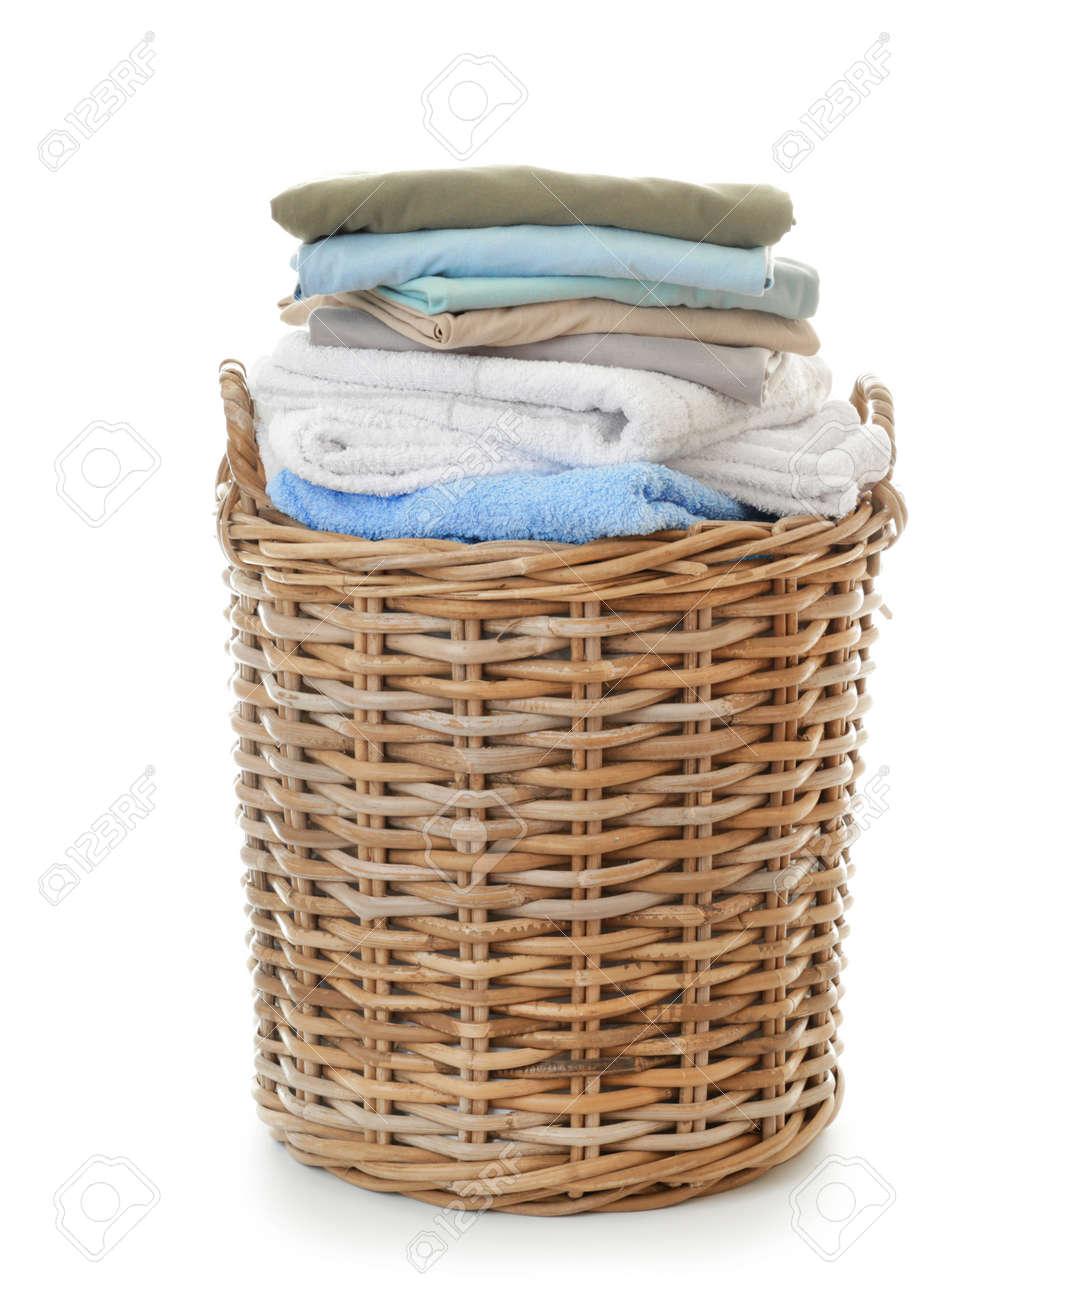 Basket with laundry on white background - 165345046